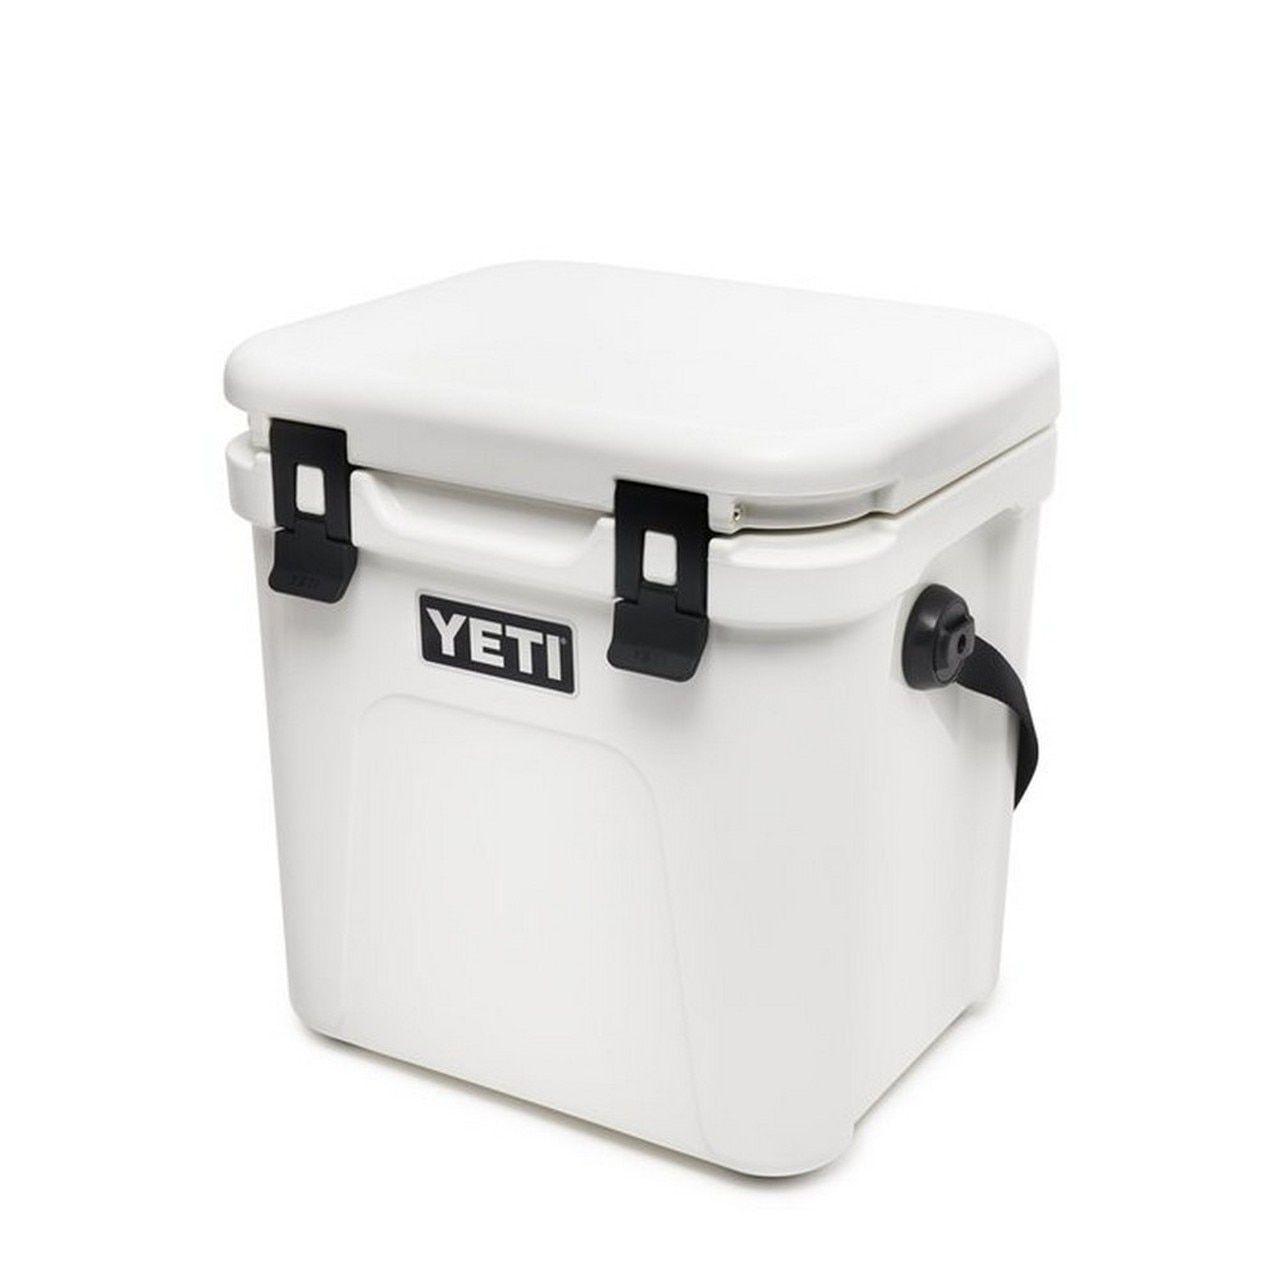 Yeti Roadie 24 Hard Cooler In 2020 Yeti Yeti Roadie Cooler